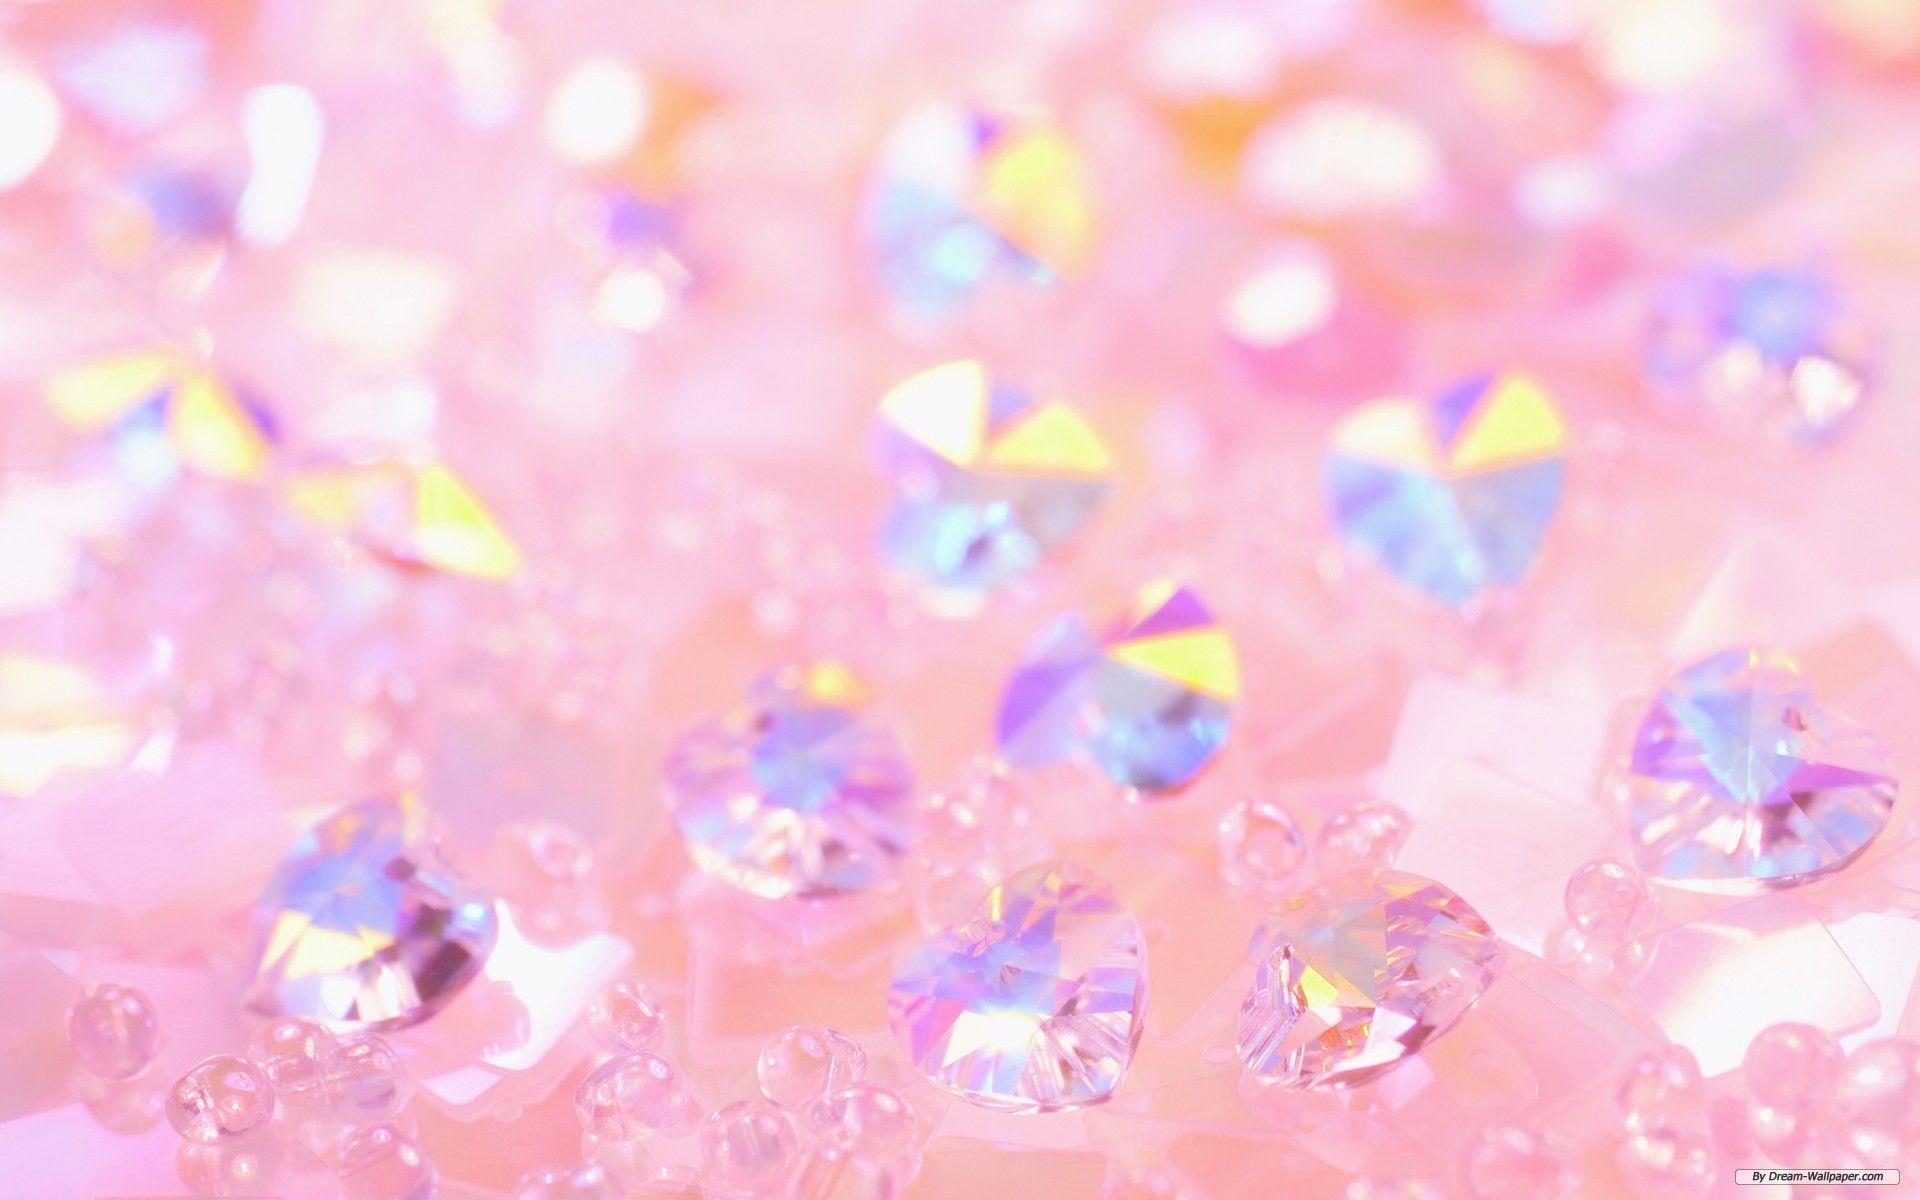 marvelouswallpaperbackgroundsparklydiamondsadmin